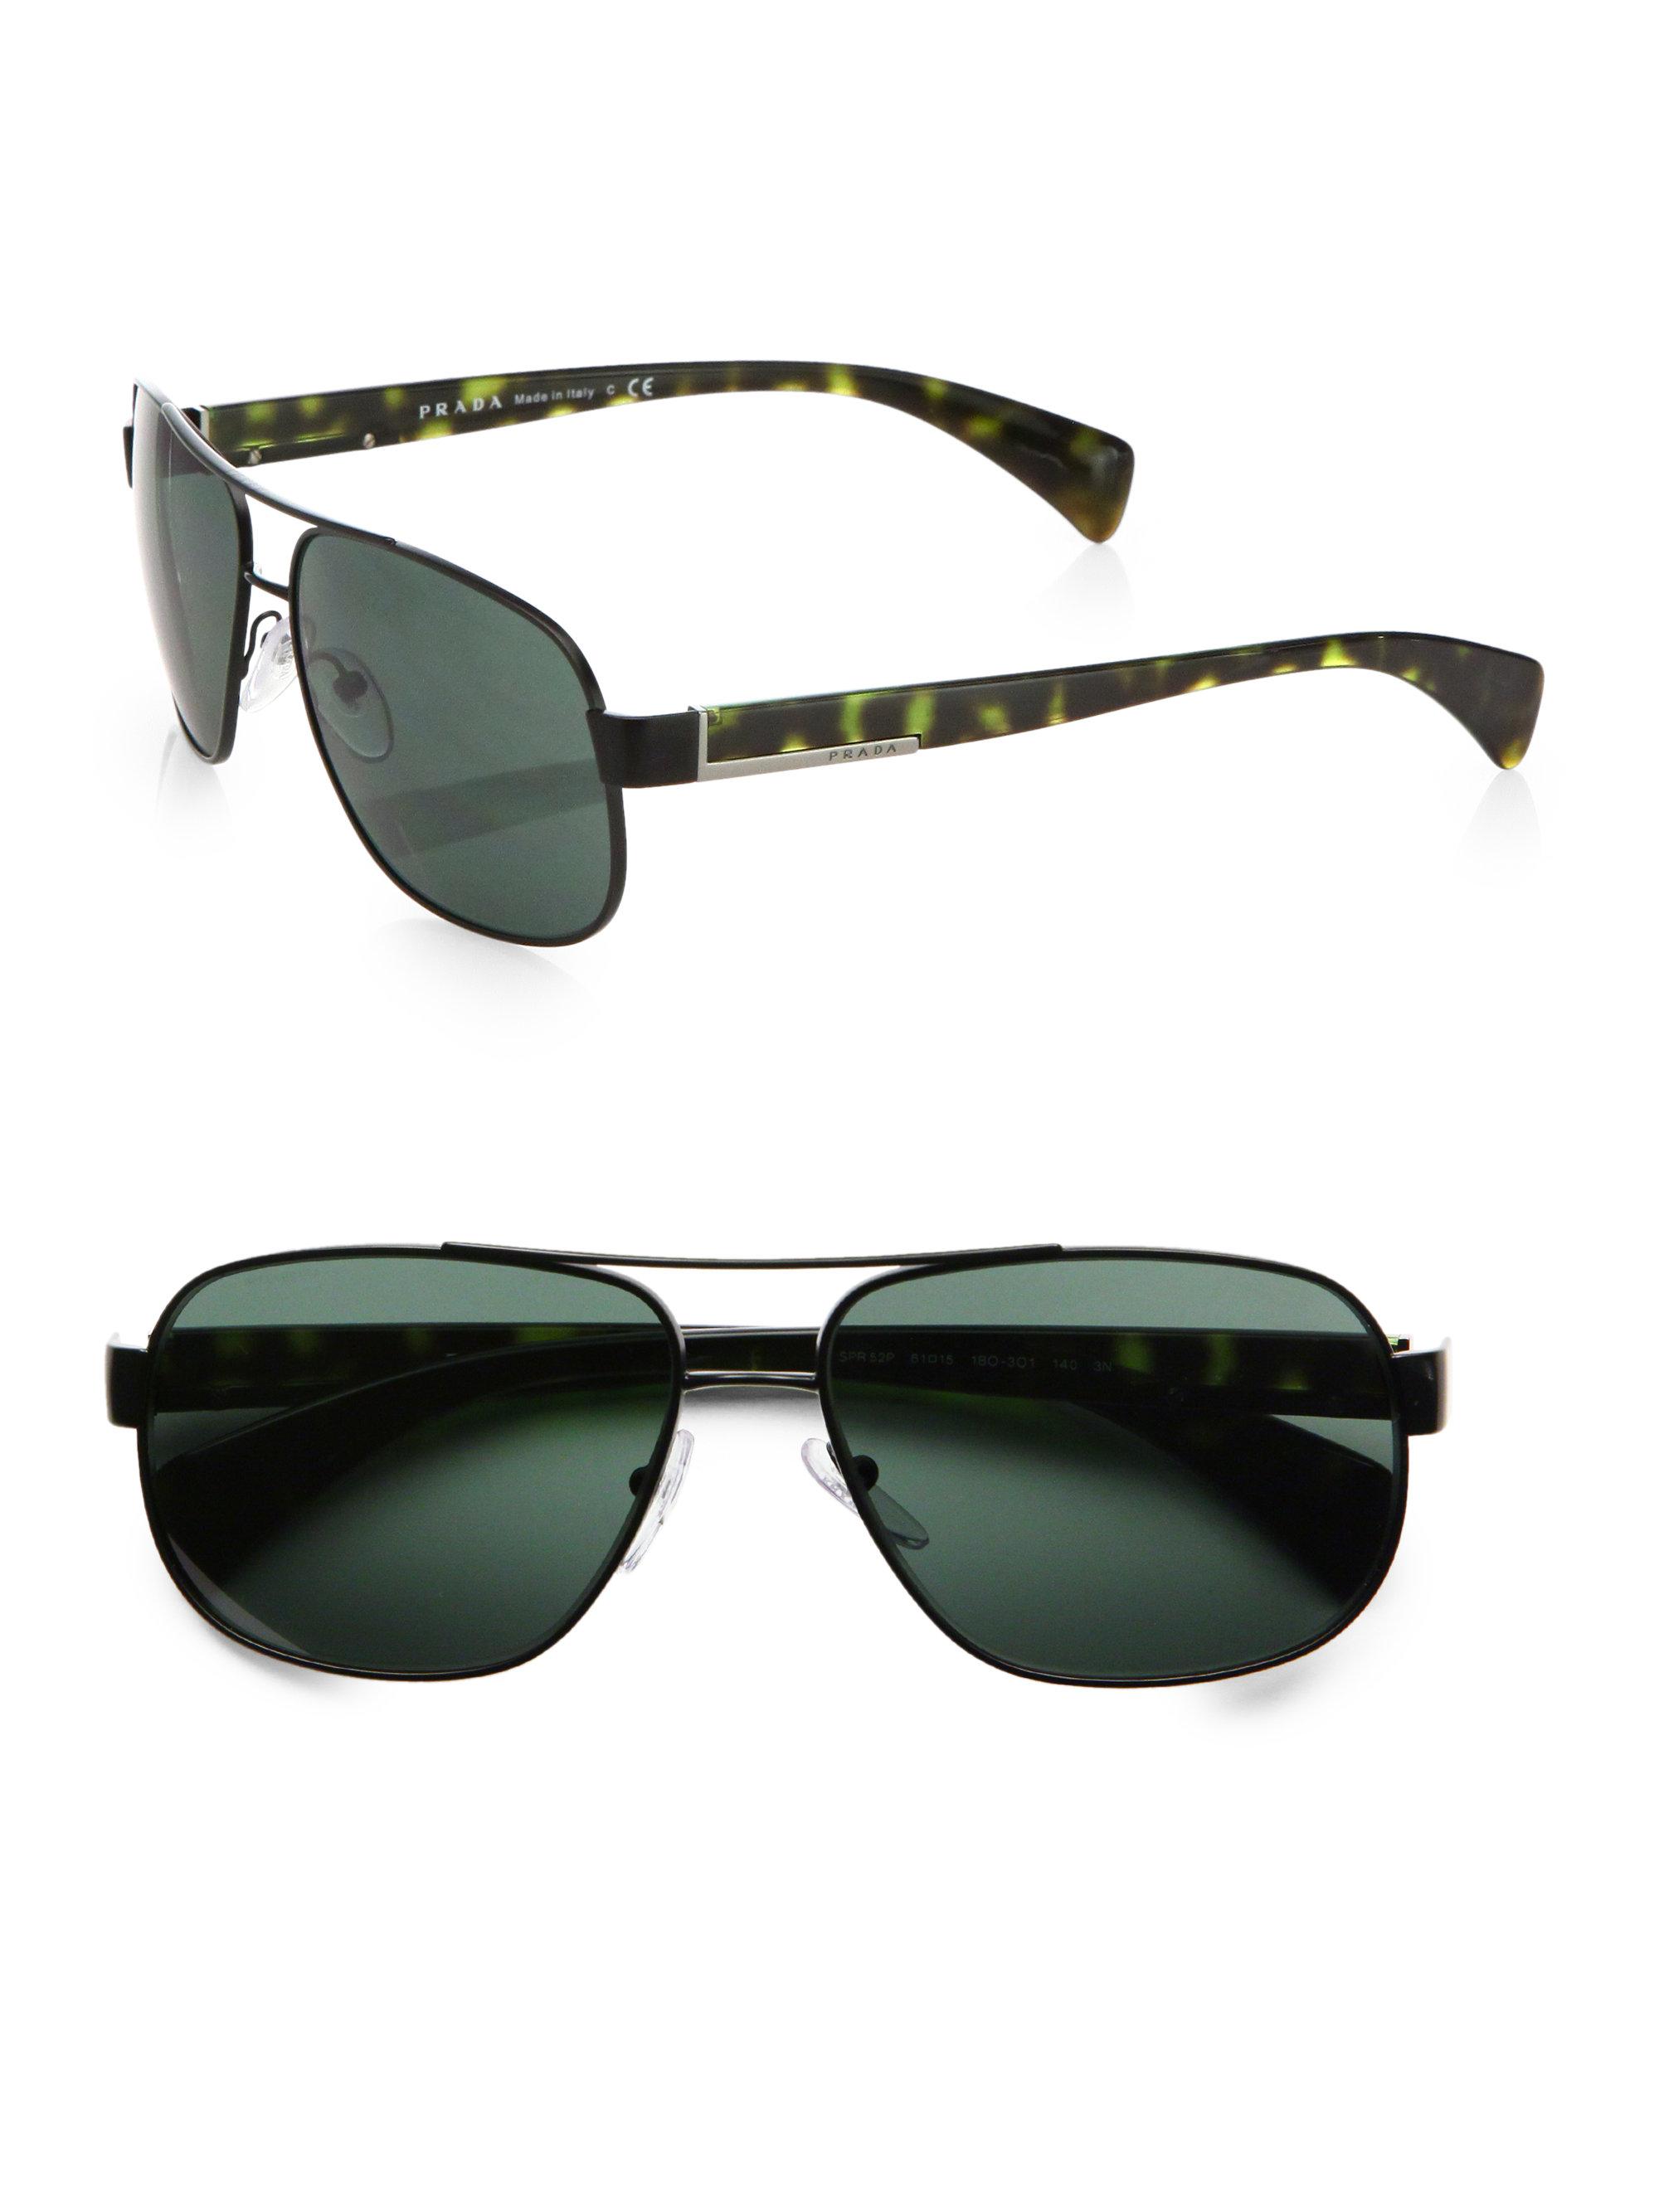 5c7552a9792 ... sale lyst prada classic metal pilot sunglasses in black for men 34d47  49cbc